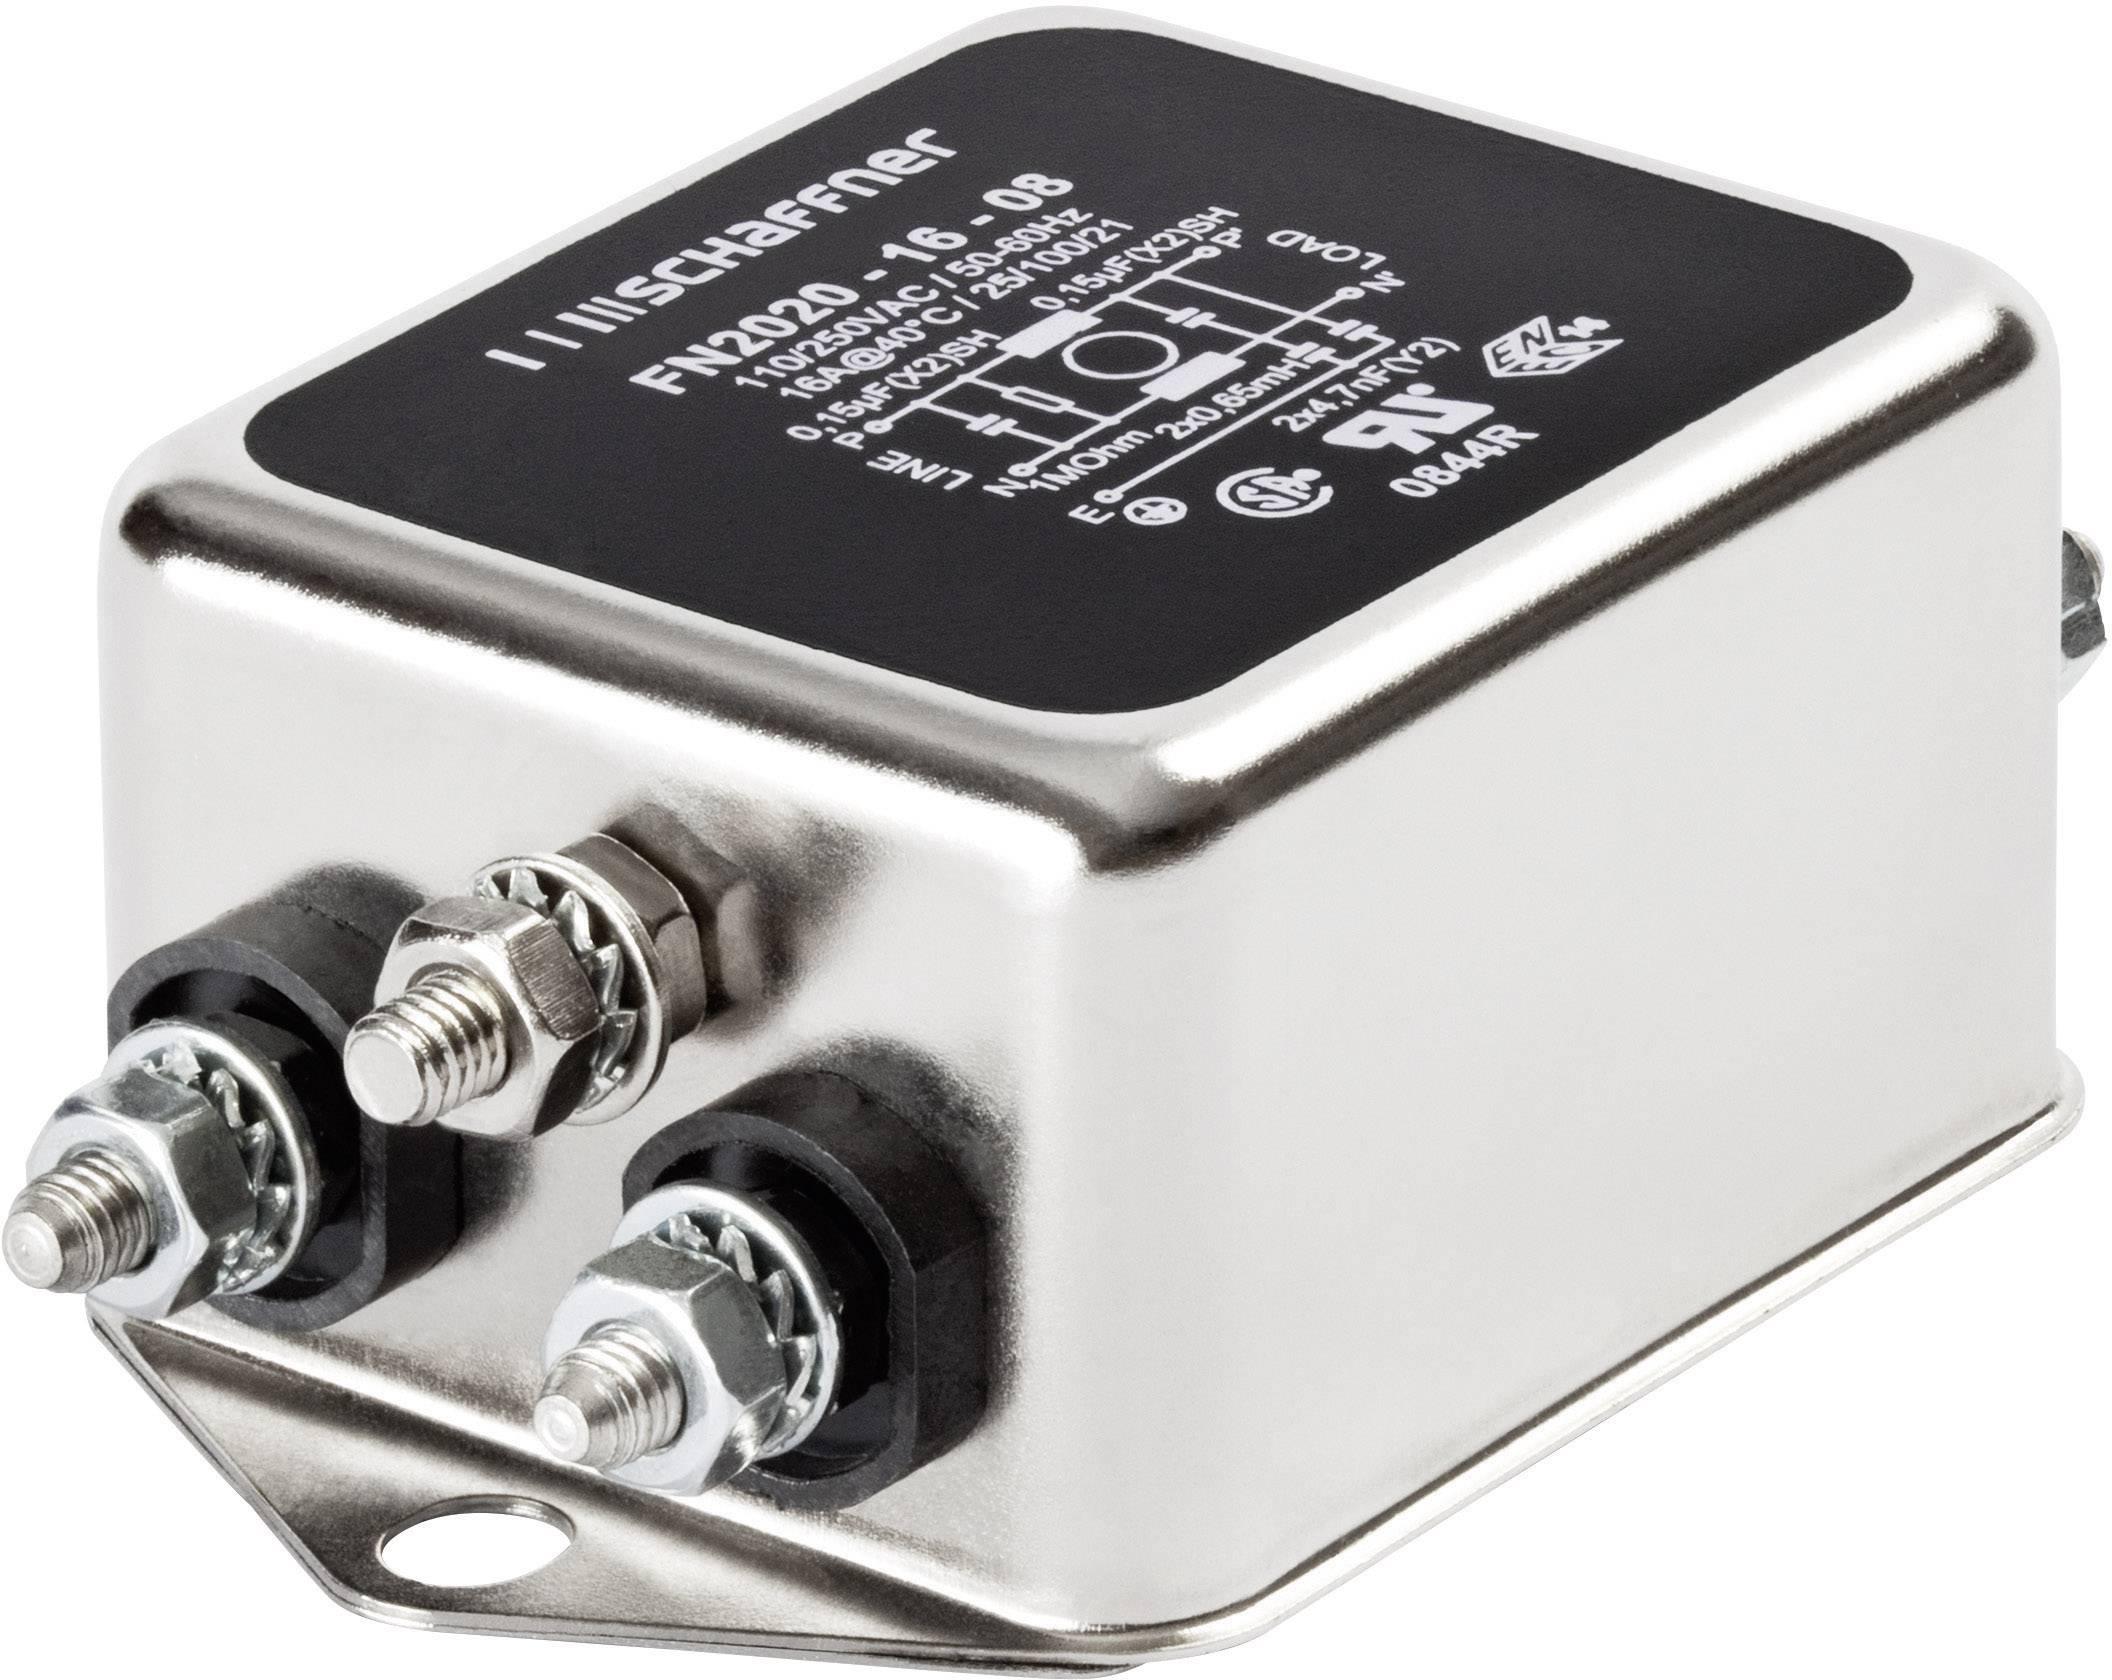 Síťový filtr Schaffner, FN 2020-3-06, 2,5 mH, 250 V/AC, 3 A